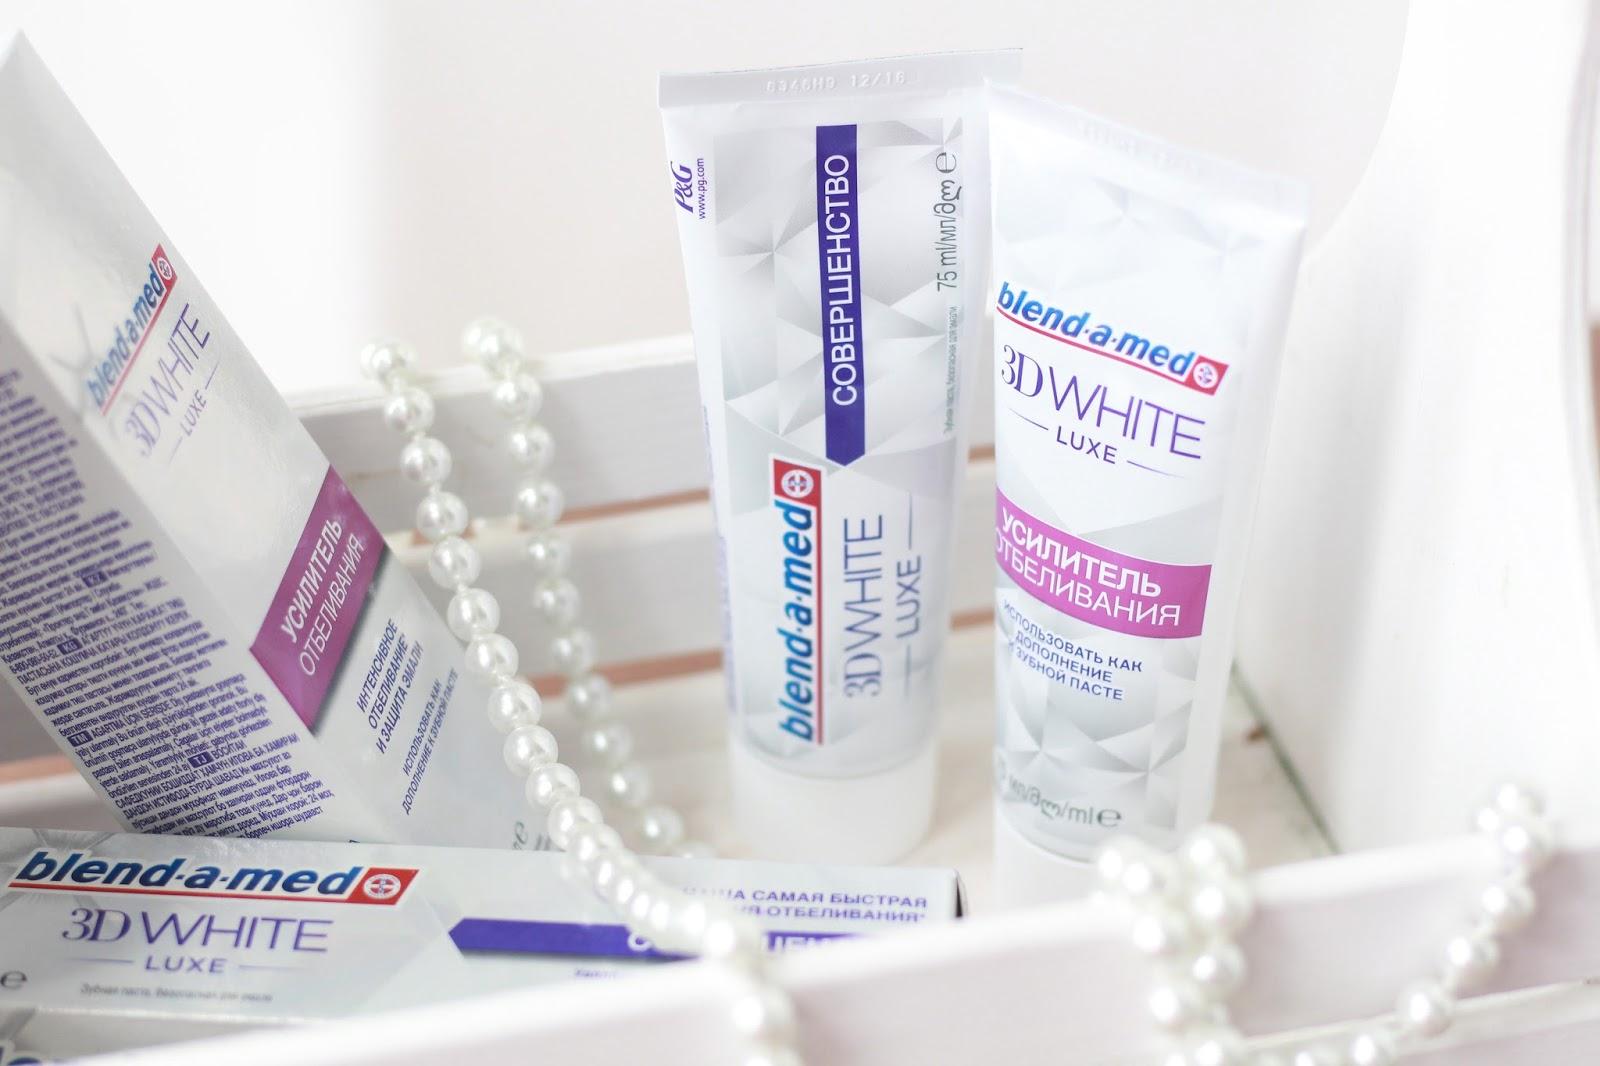 Смотреть Бьюти-новинка недели: Blend a-med 3D White Luxe Гламур видео